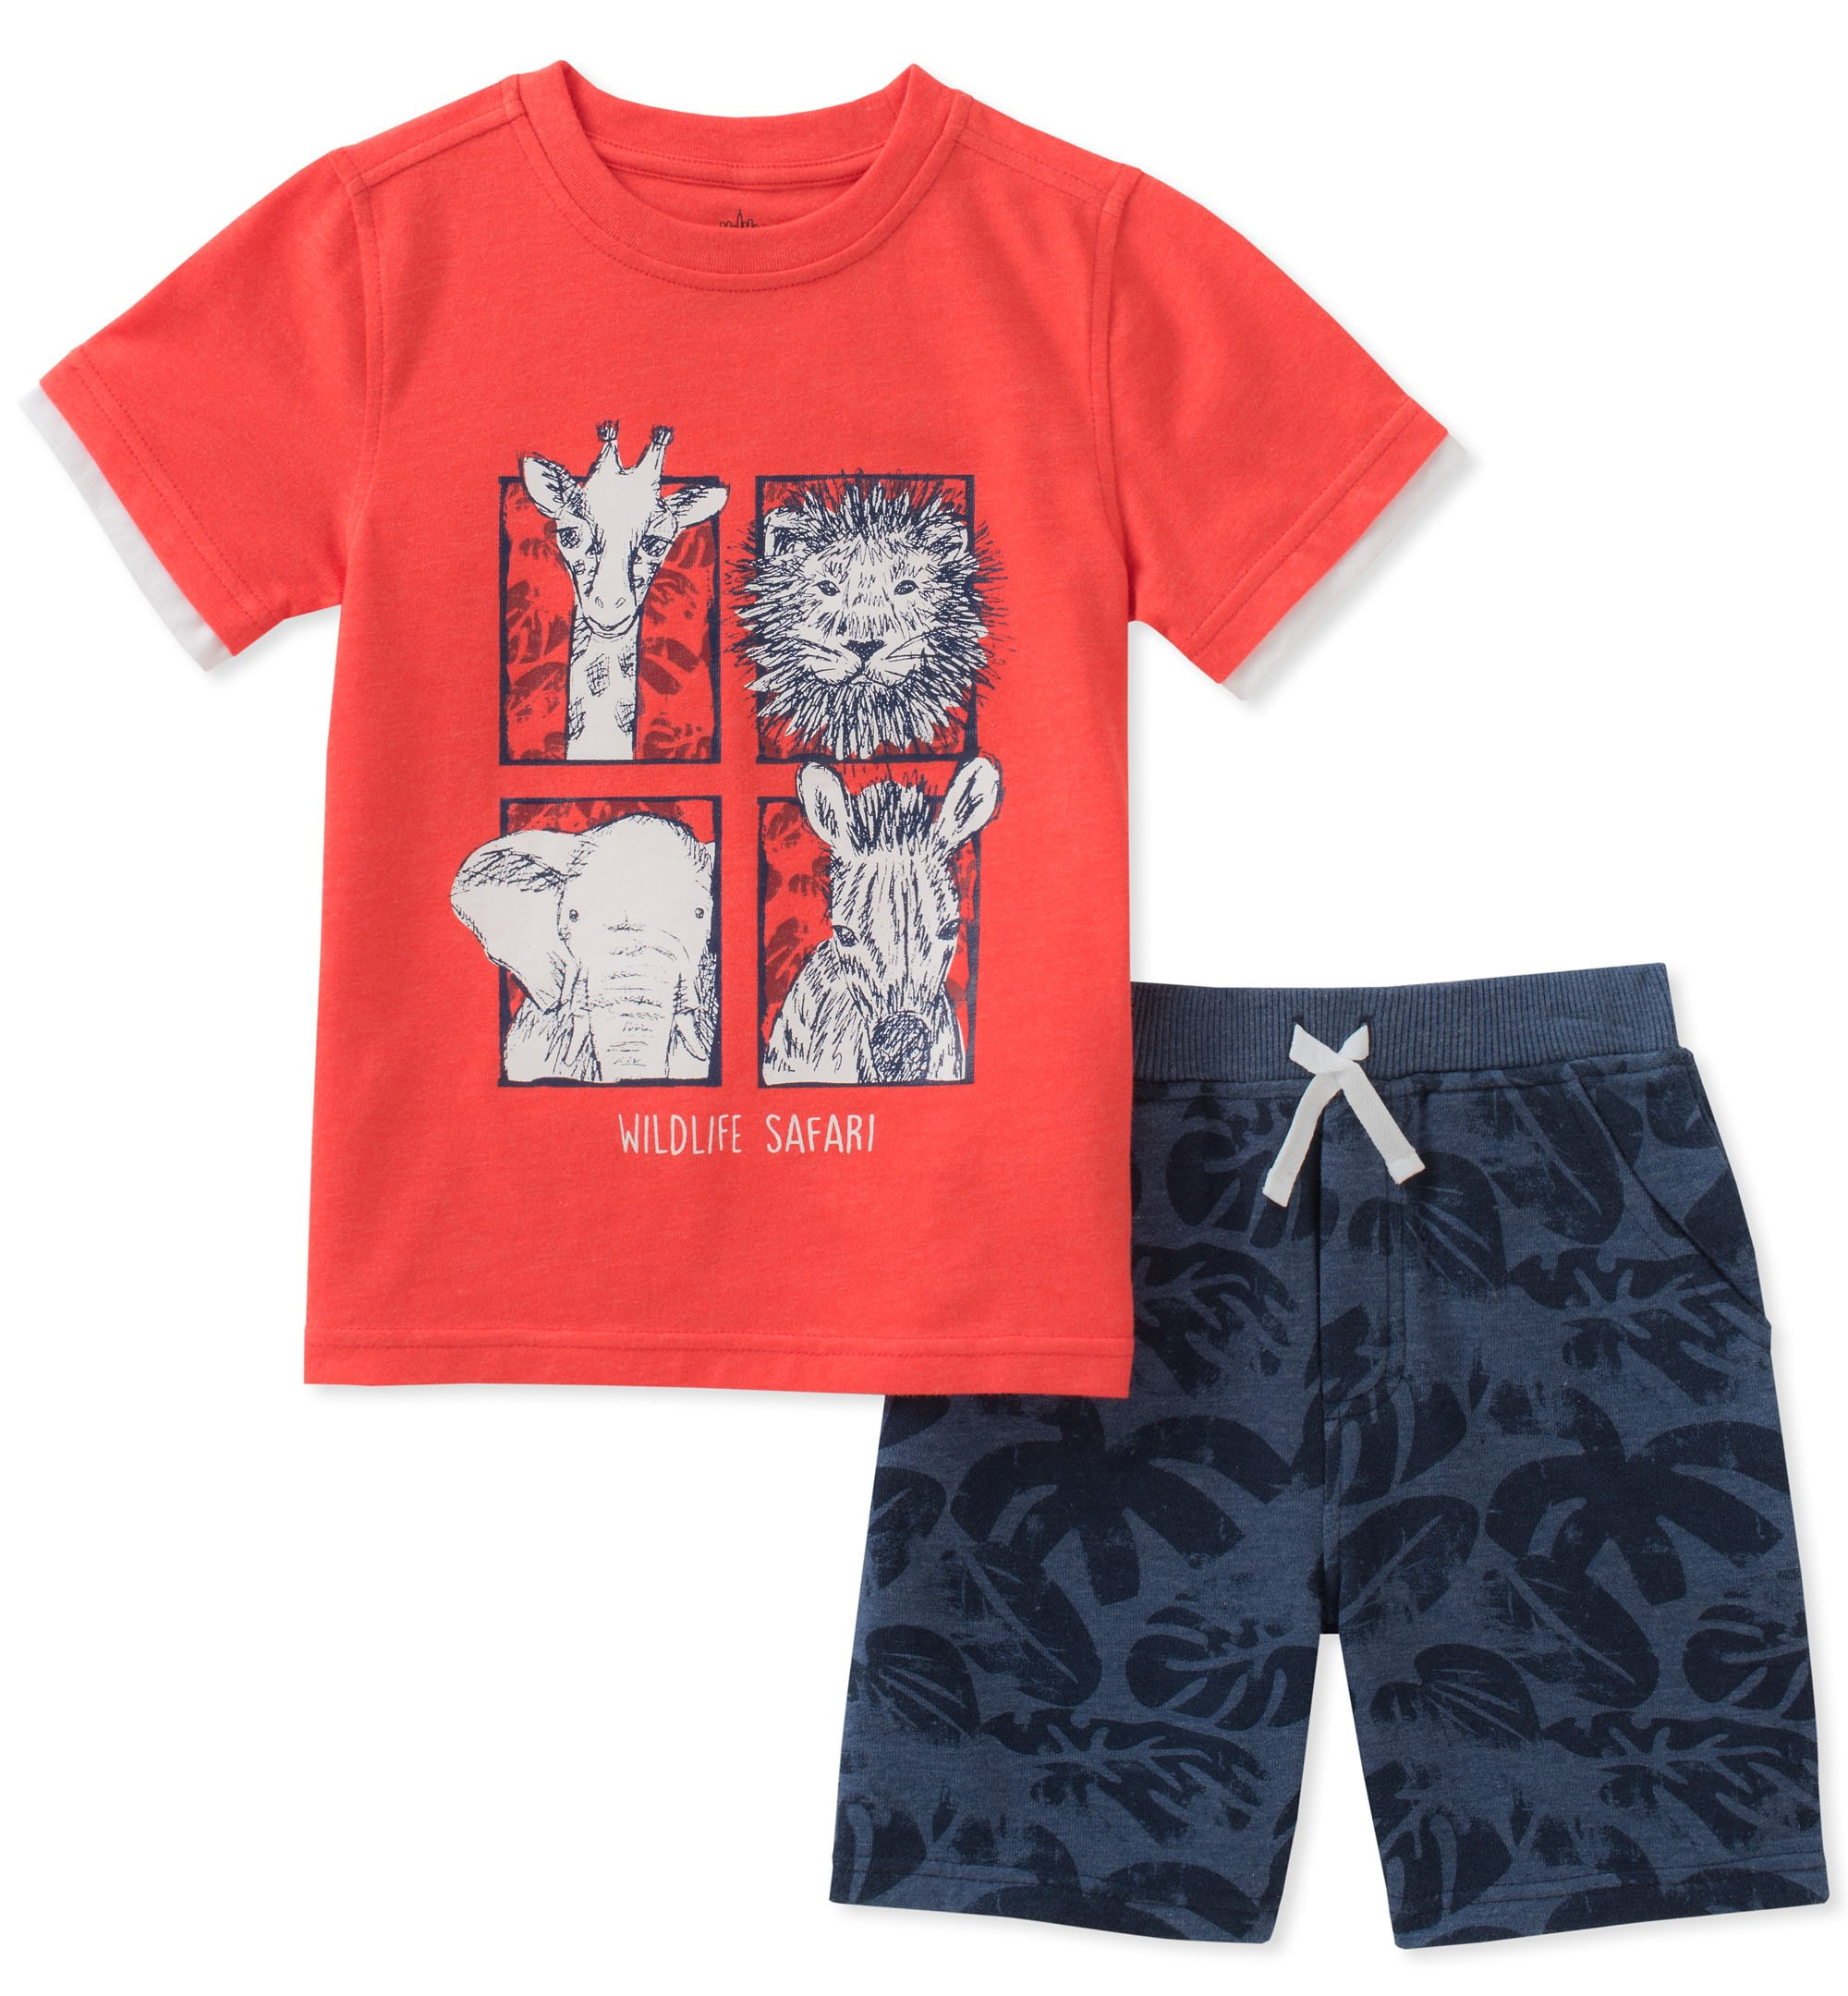 Kids Headquarters Toddler Boys' 2 Pieces Short Set, Red/Print, 4T